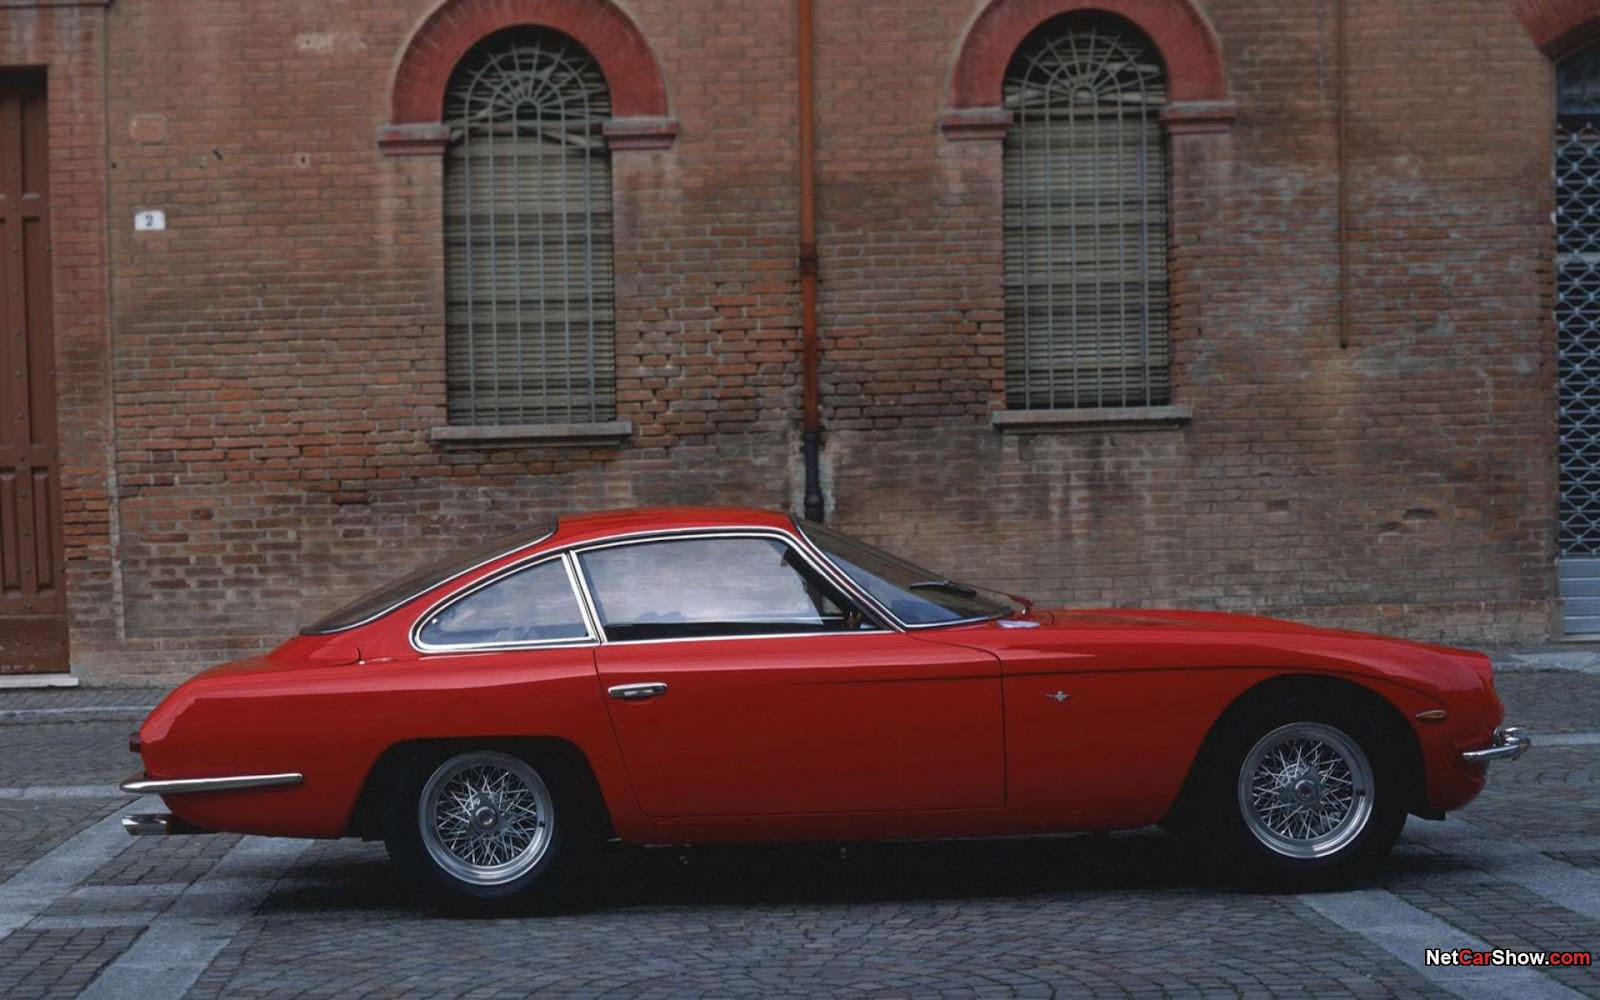 1964 Lamborghini 350 GT Wallpaper (RED LAMBO RACER)